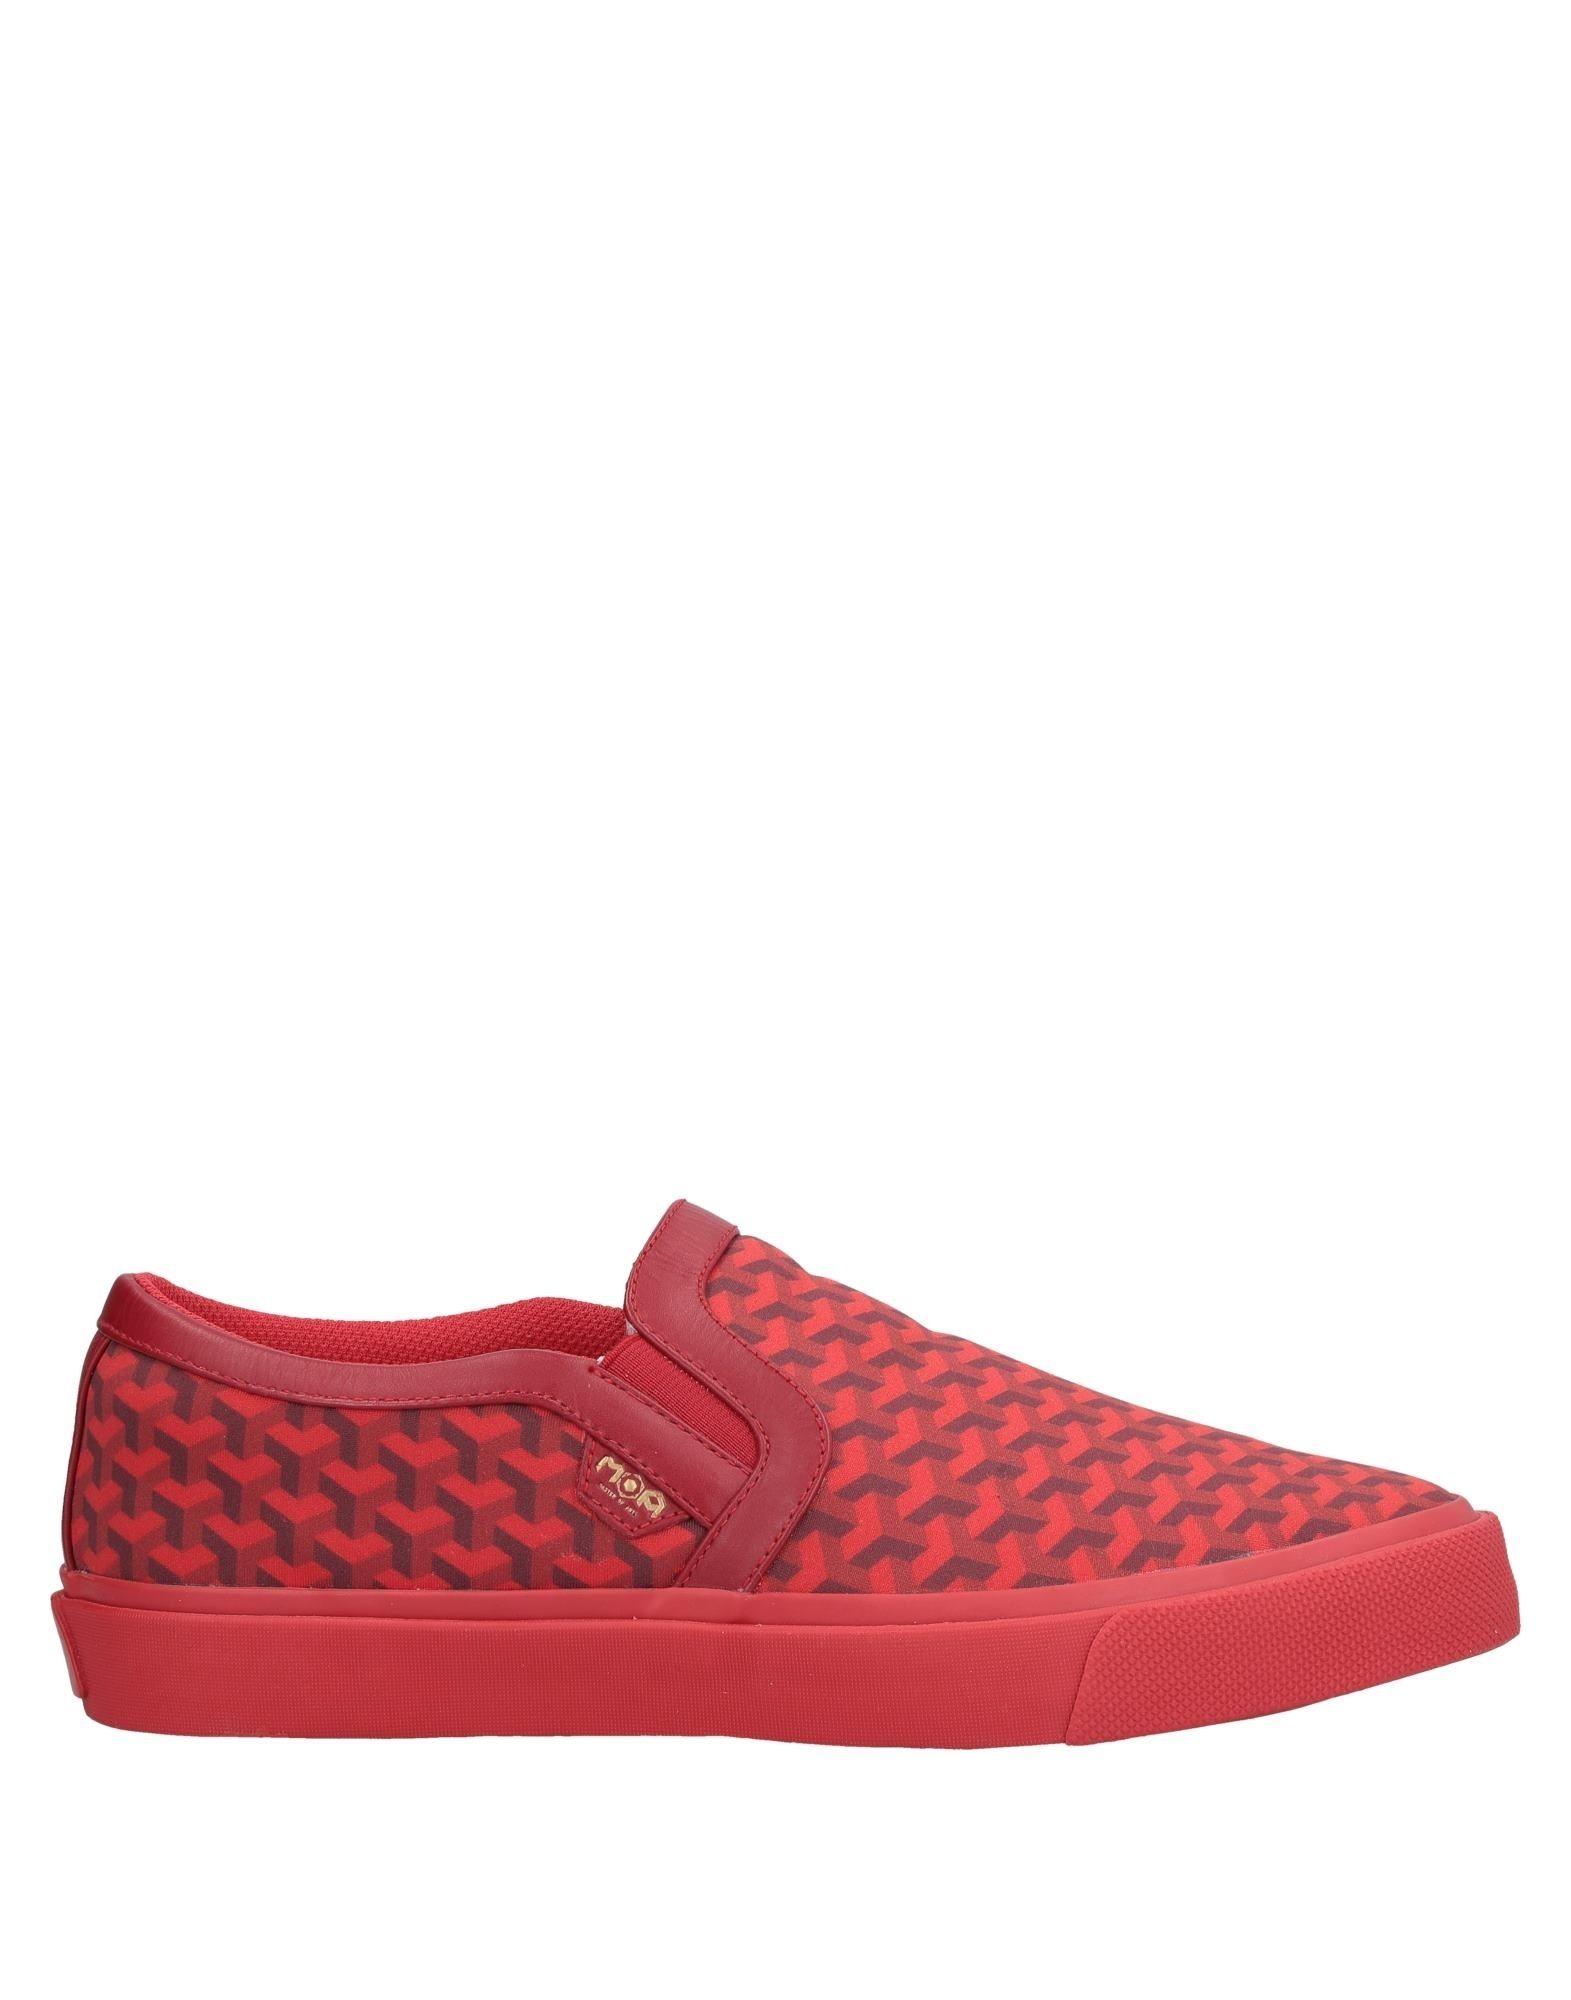 Sneakers Moa Master Of Arts Uomo - 11537086LI